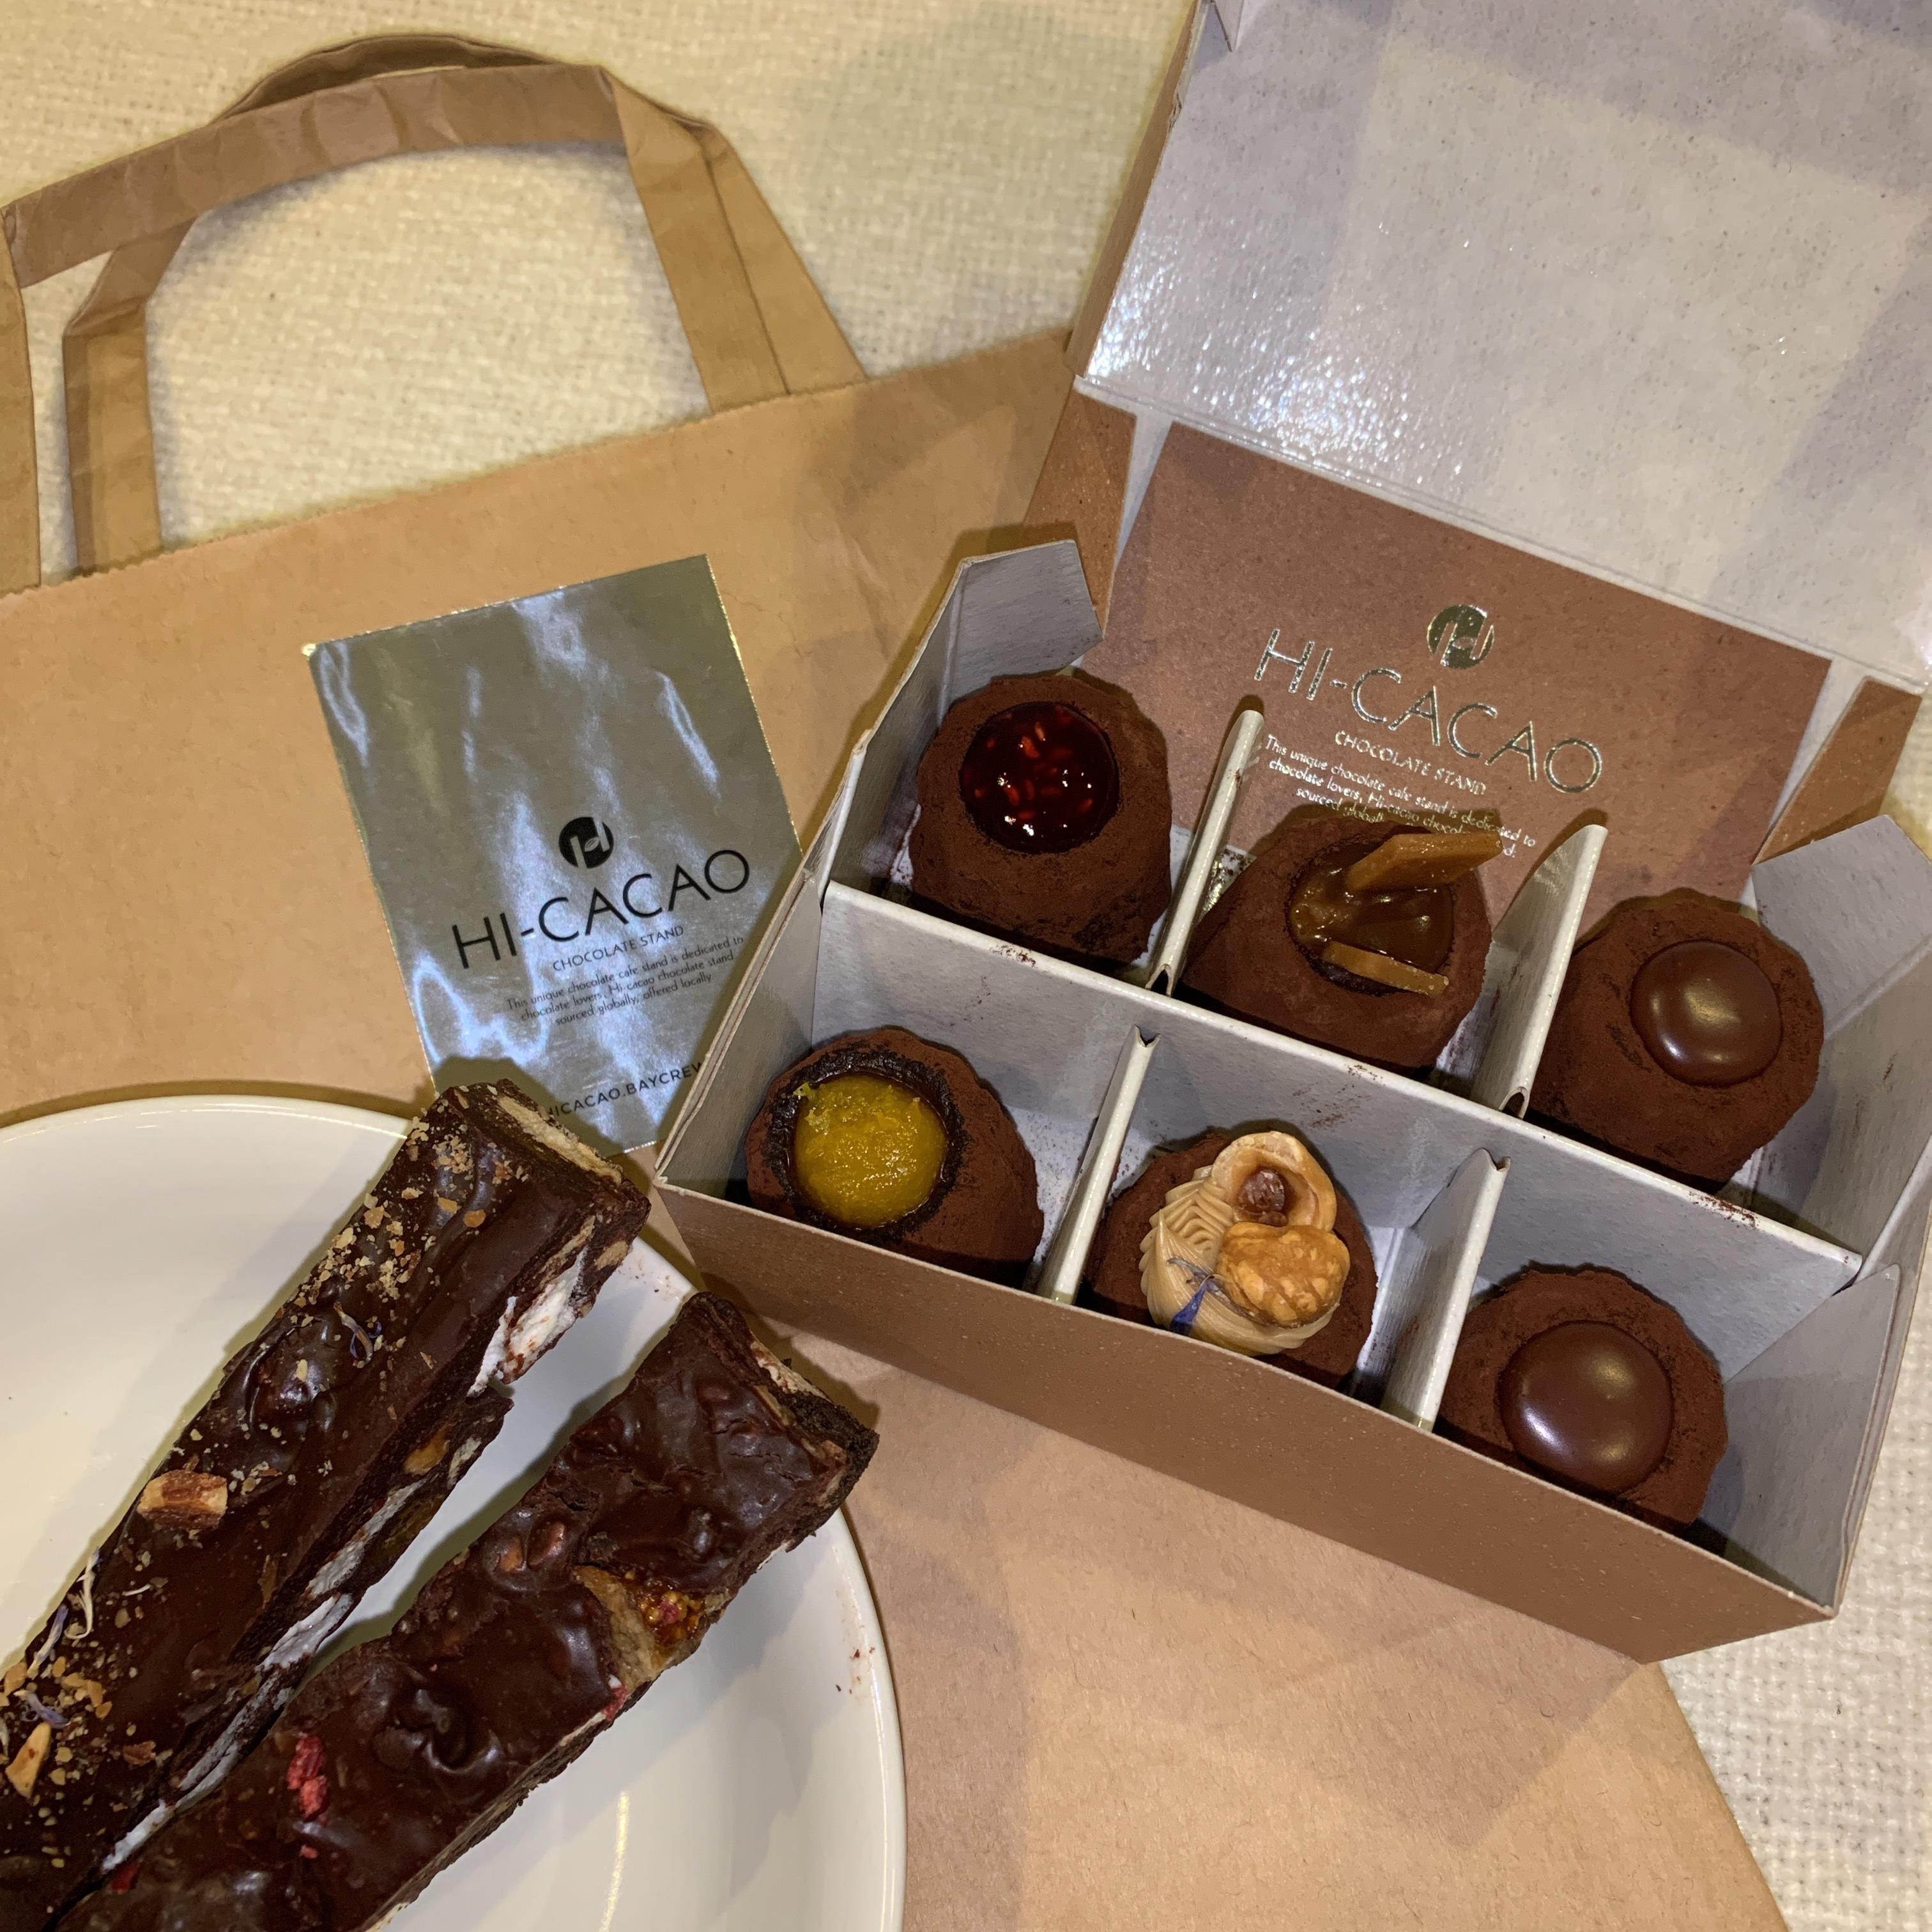 ❁︎HI-CACAO Chocolate Stand❁︎ _1_1